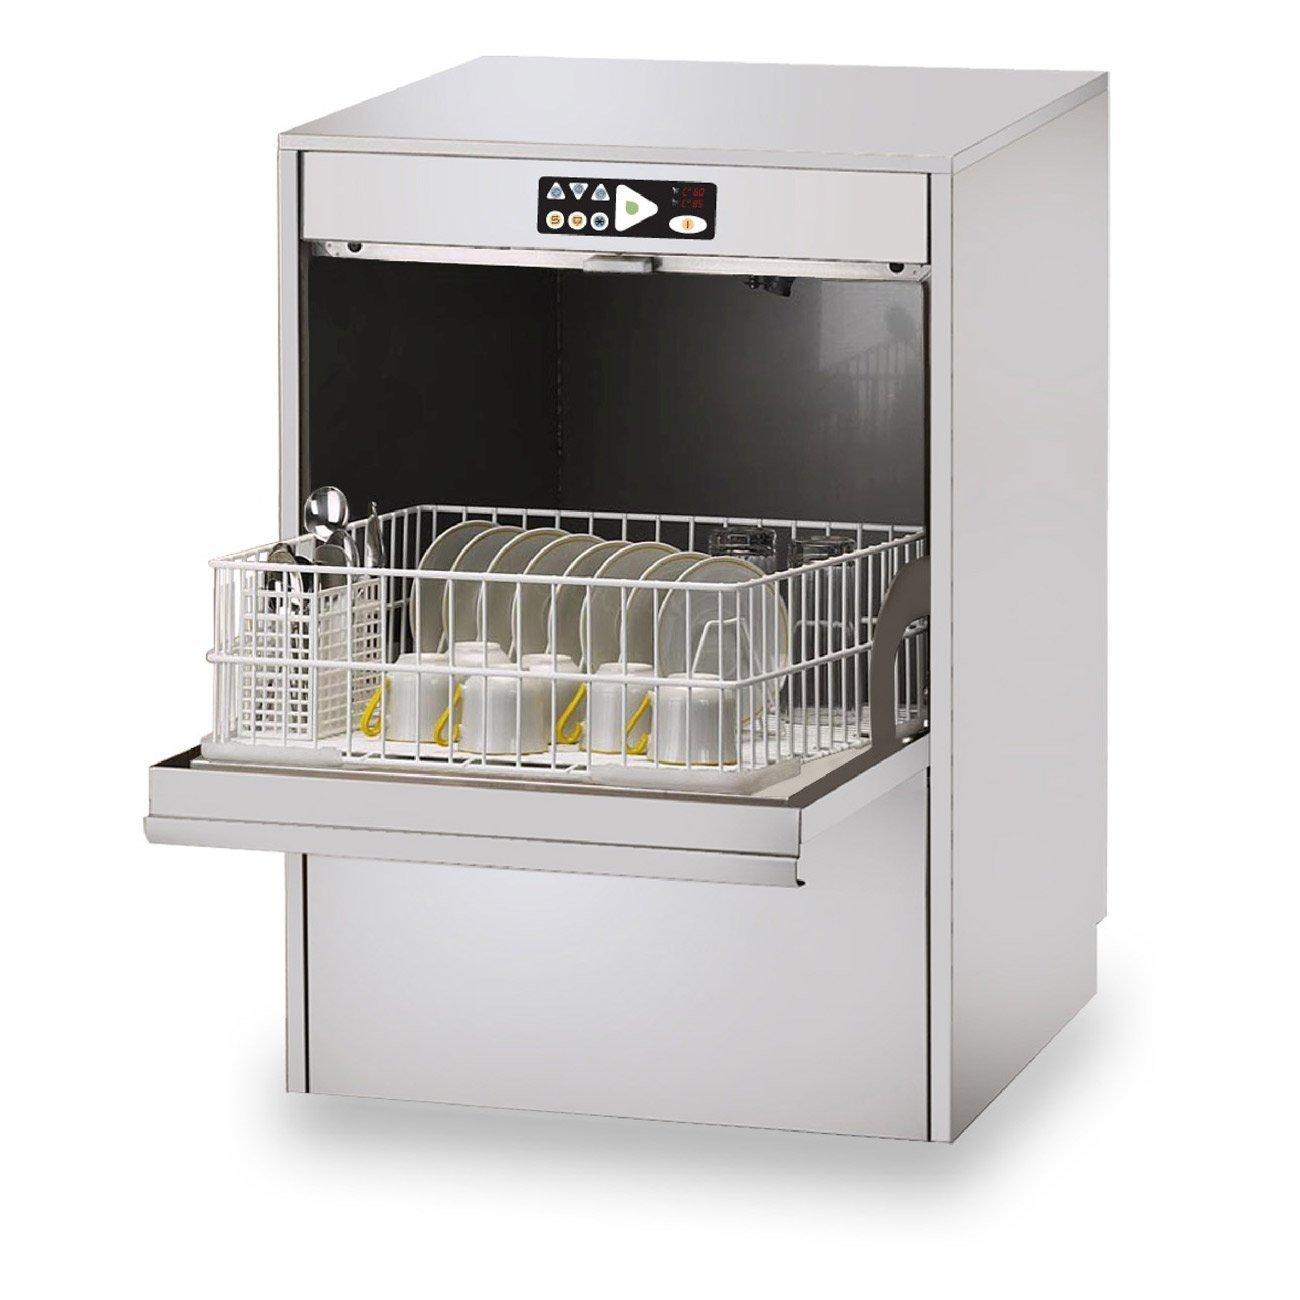 Gastronomie Spülmaschine Metro : sp lmaschine gastronomie makina le hal nas l y kan r ~ Frokenaadalensverden.com Haus und Dekorationen